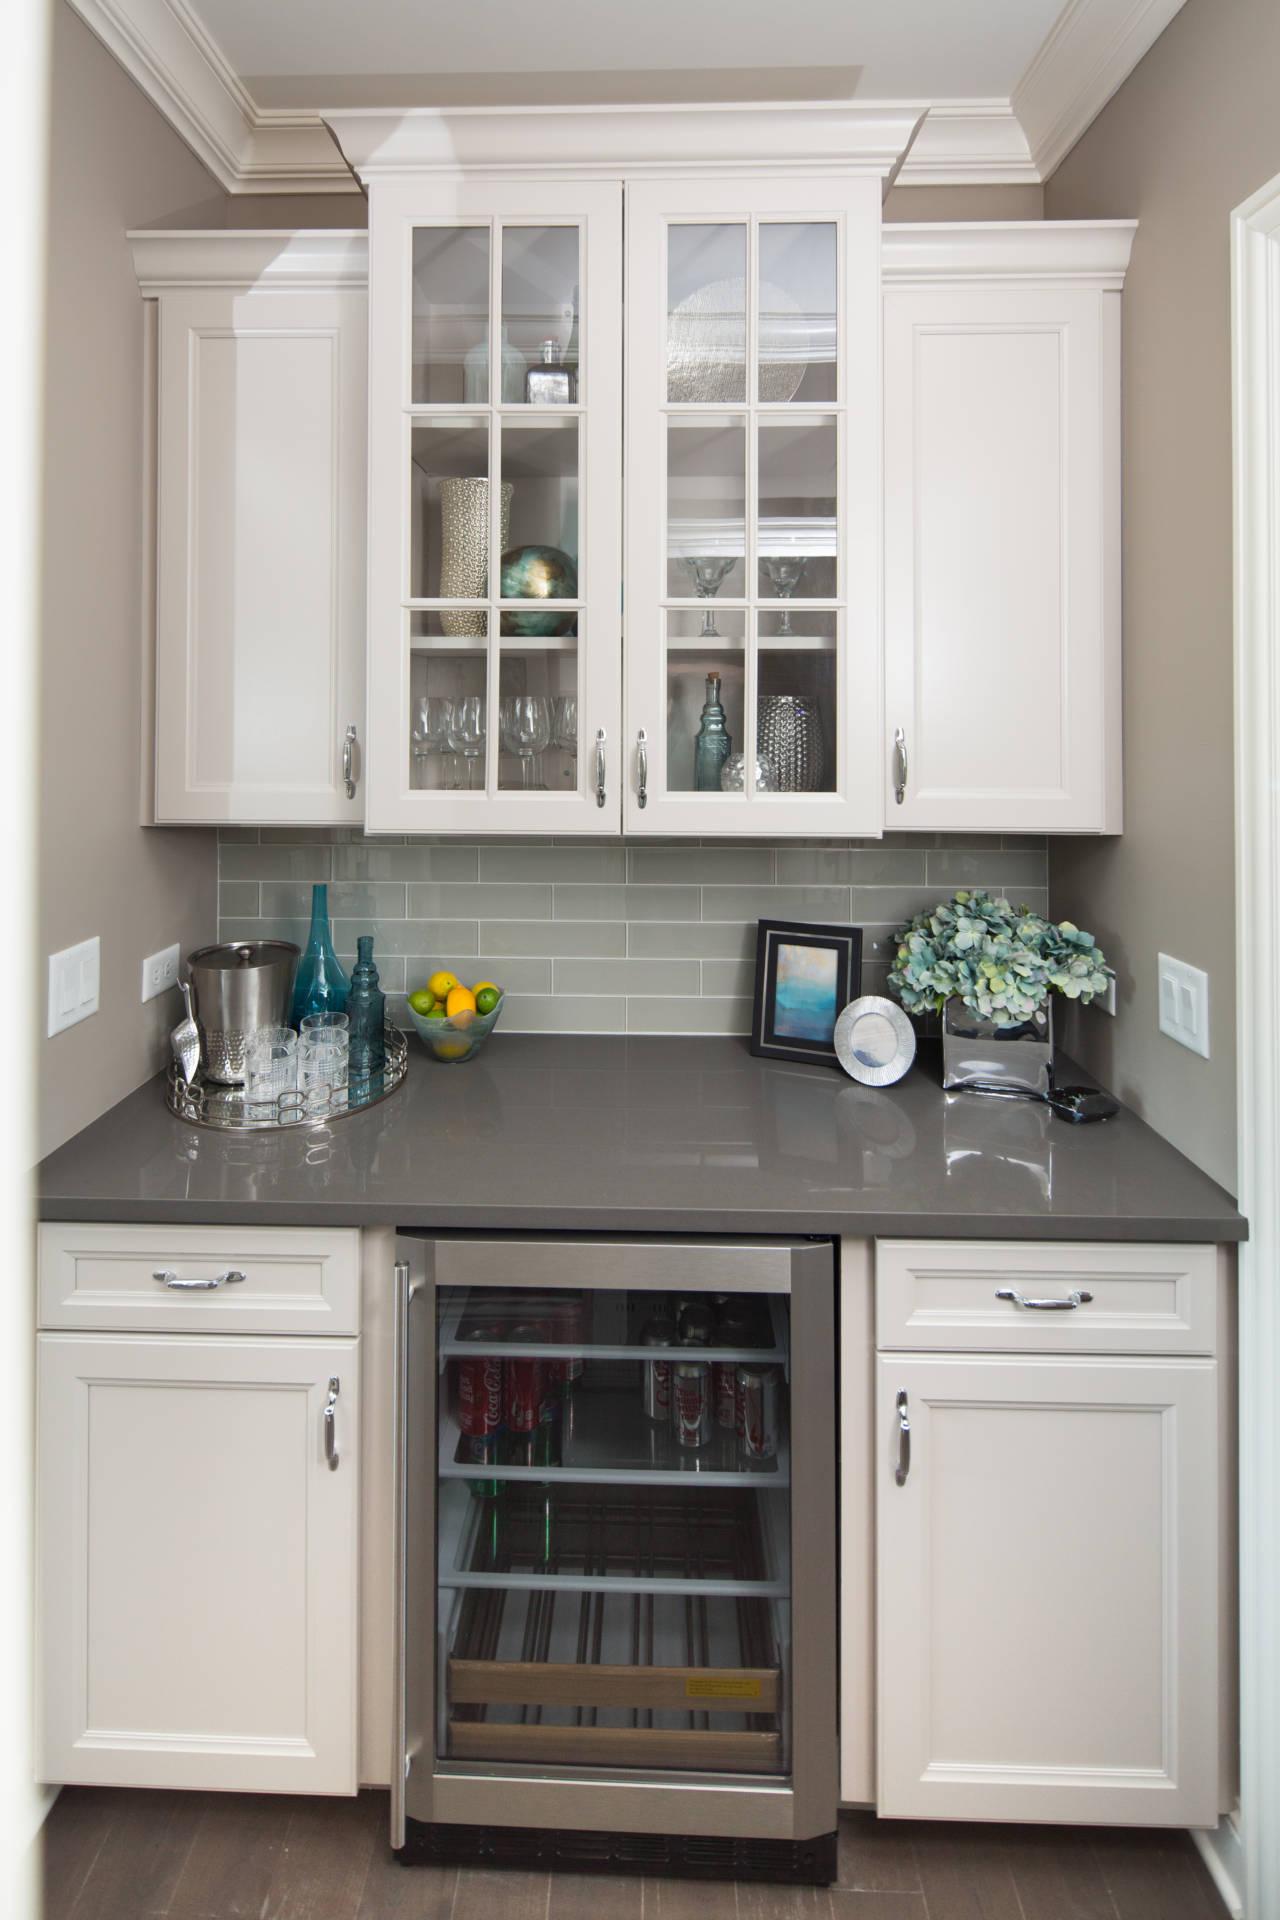 silvertonbutlerspantry  Beechen  Dill Homes